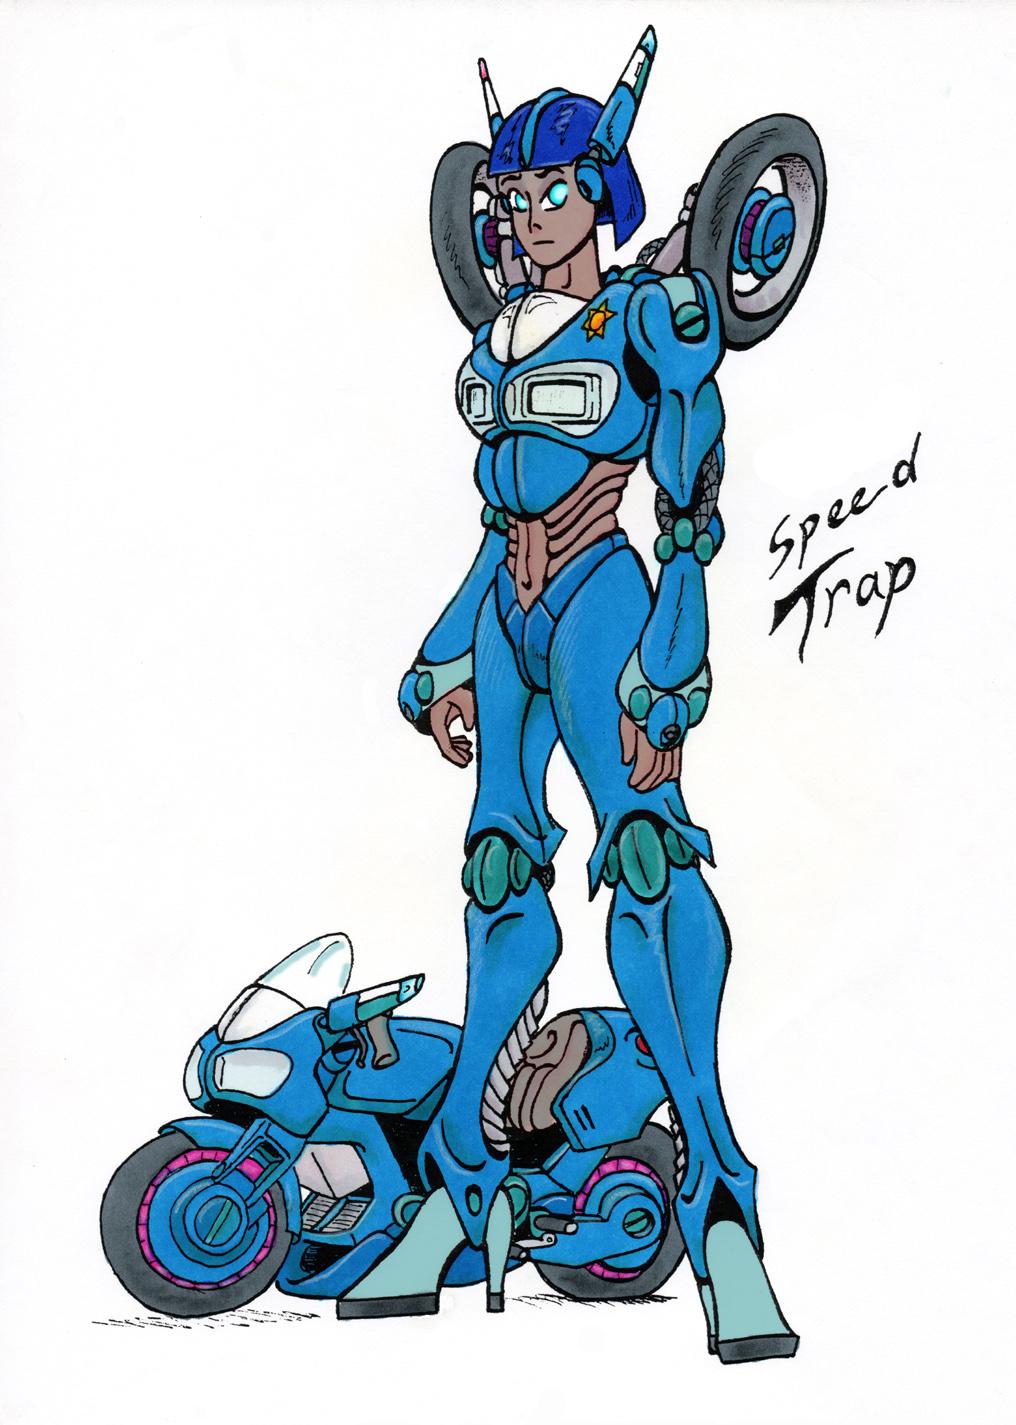 Speed Trap 1